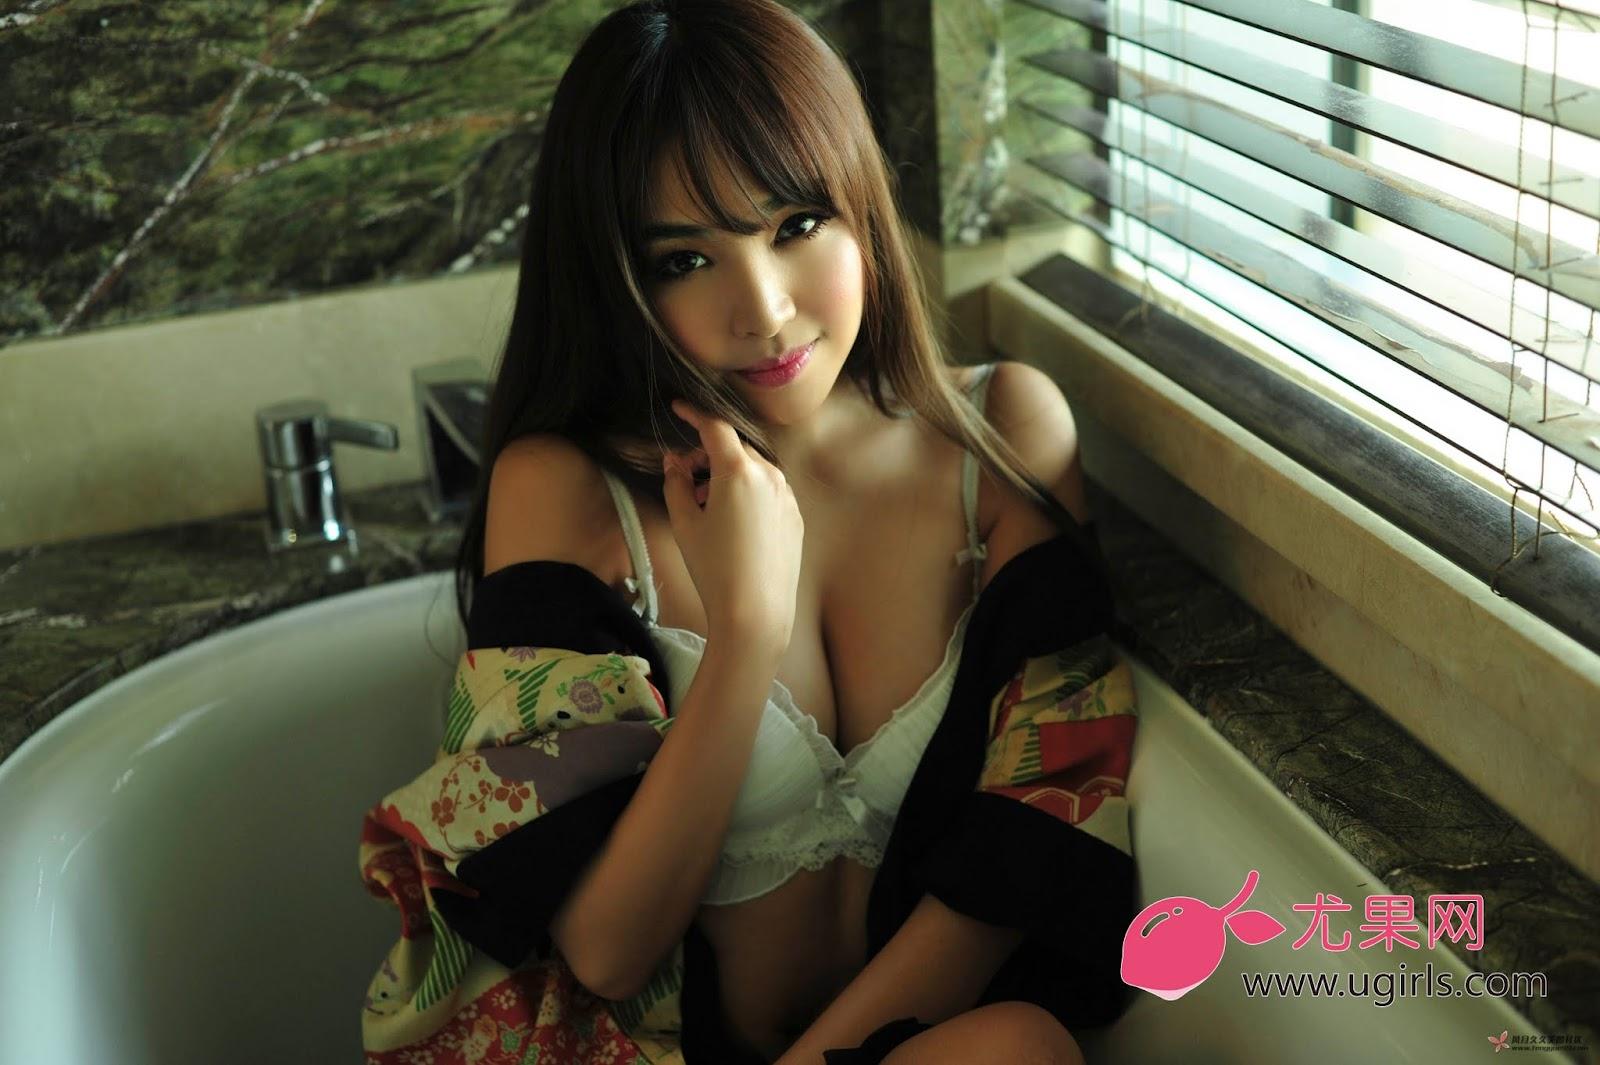 Hot Girl Model UGIRLS NO.13